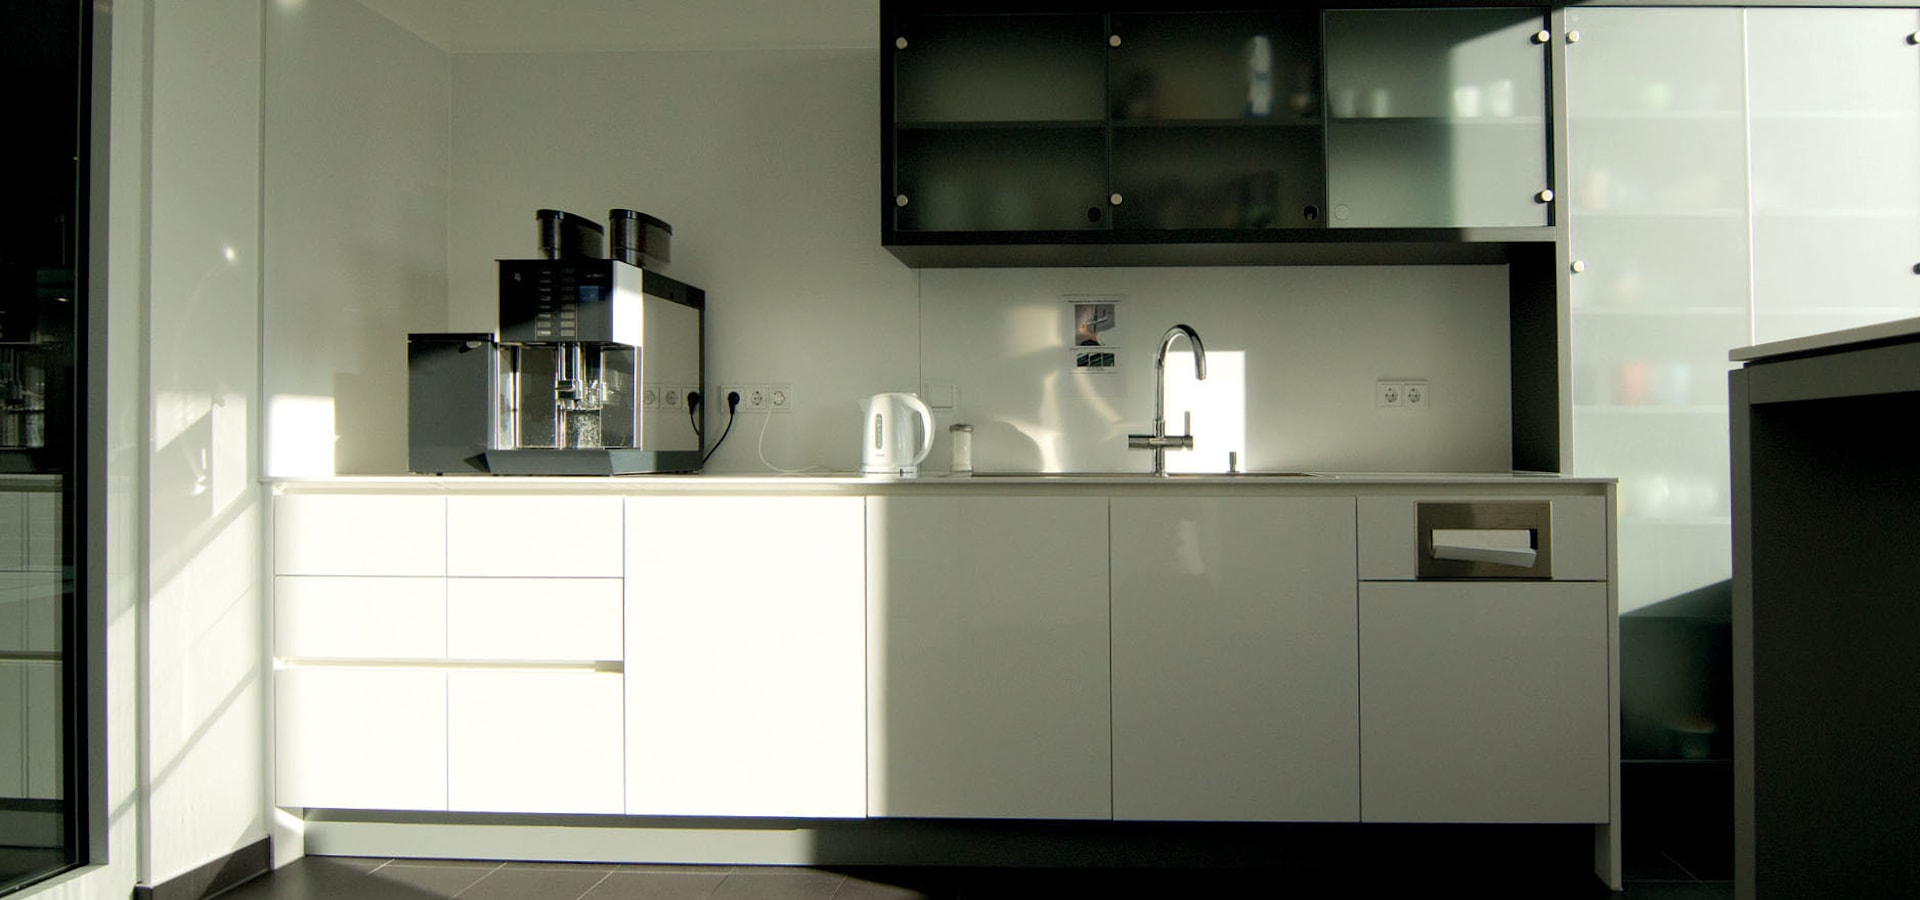 Beyss Architekten GmbH